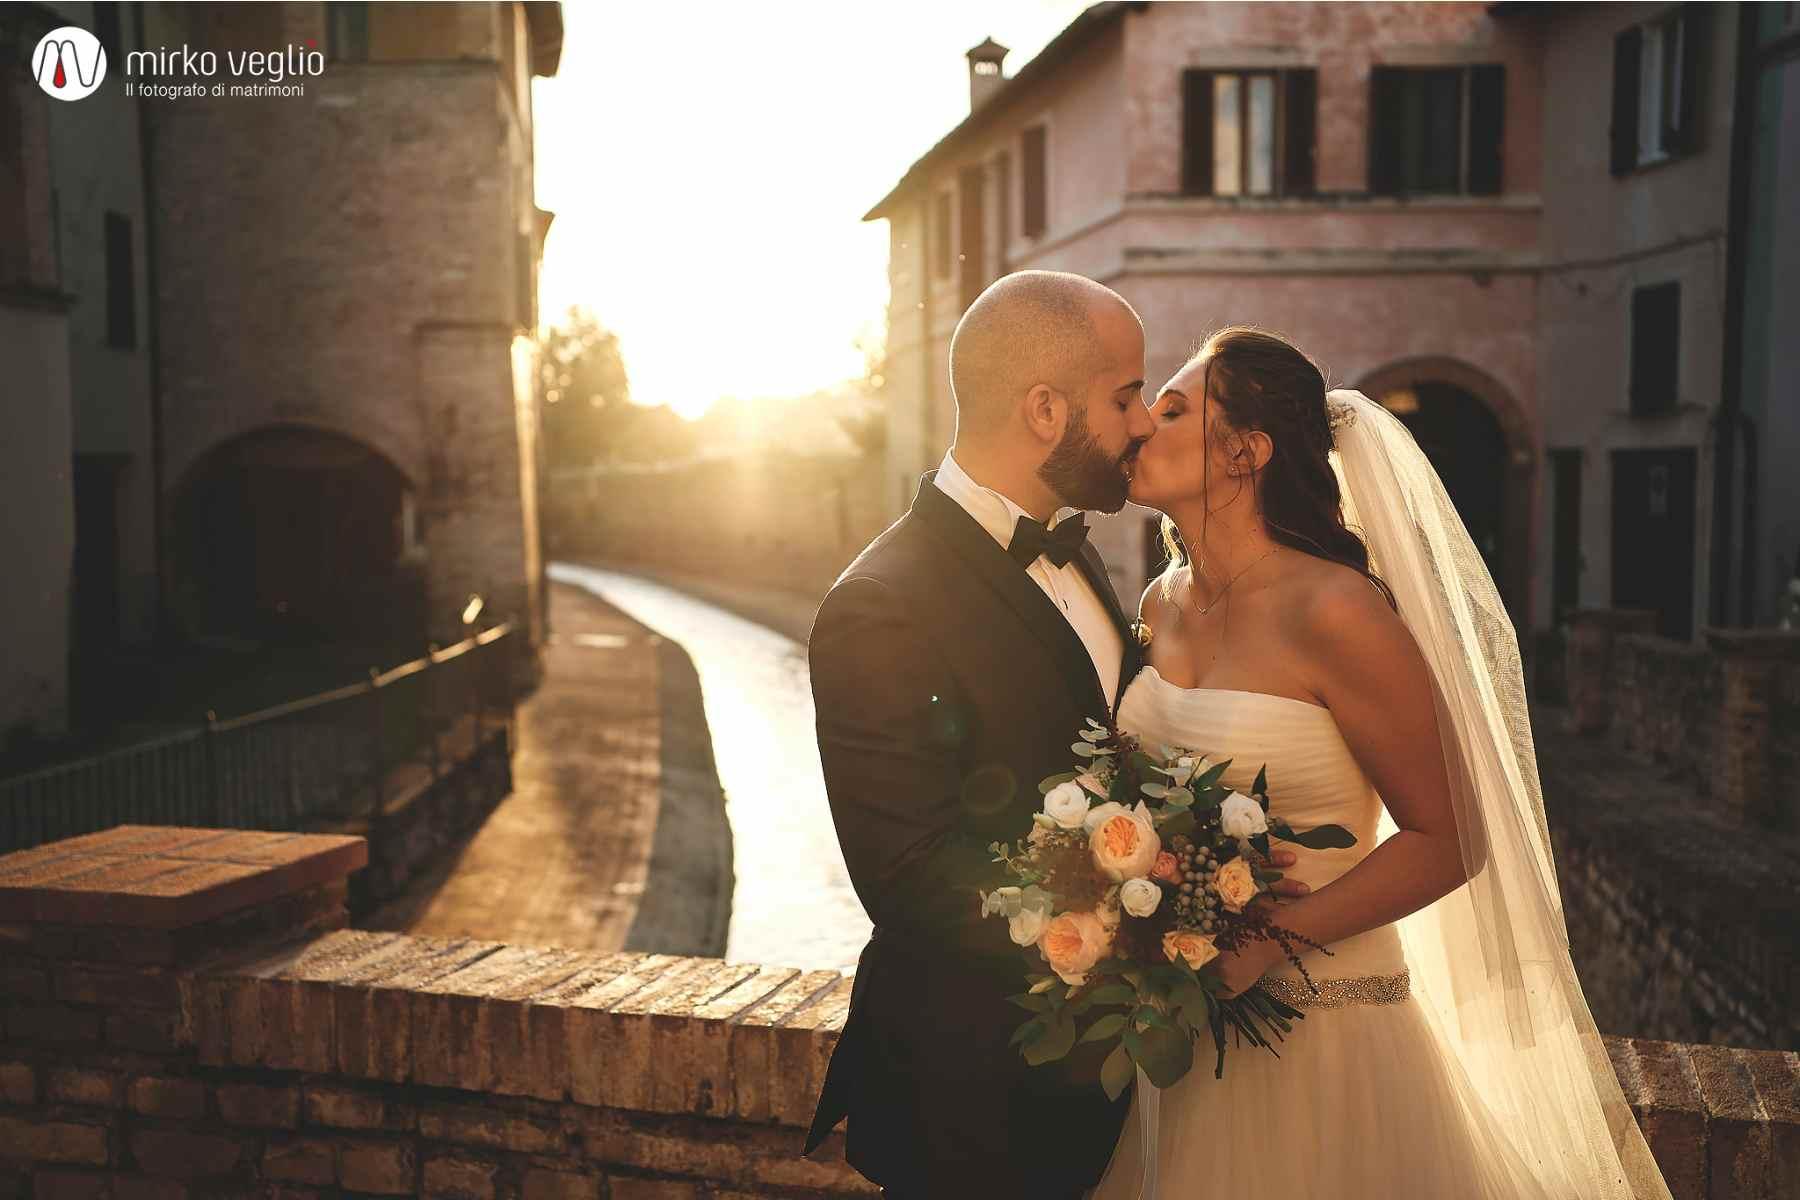 Romantic Italian Book Wedding Package